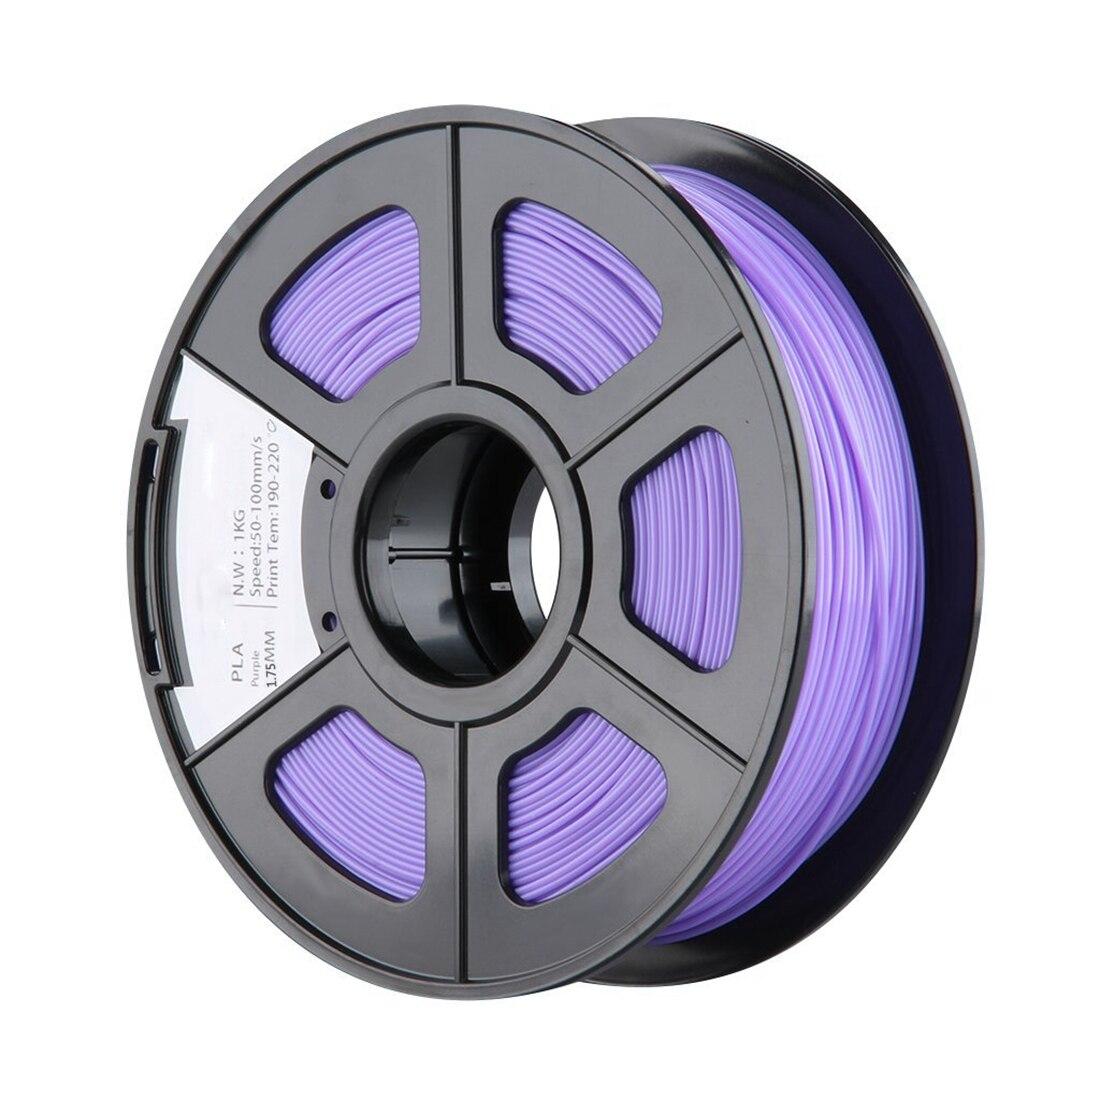 New 1.75mm PLA 3D Printer Filament - 1kg Spool (2.2 lbs) - Dimensional Accuracy +/- 0.02mm - Multi Colors Available (Purple)  biqu new spool filament mount rack bracket for pla abs filament 3d printer